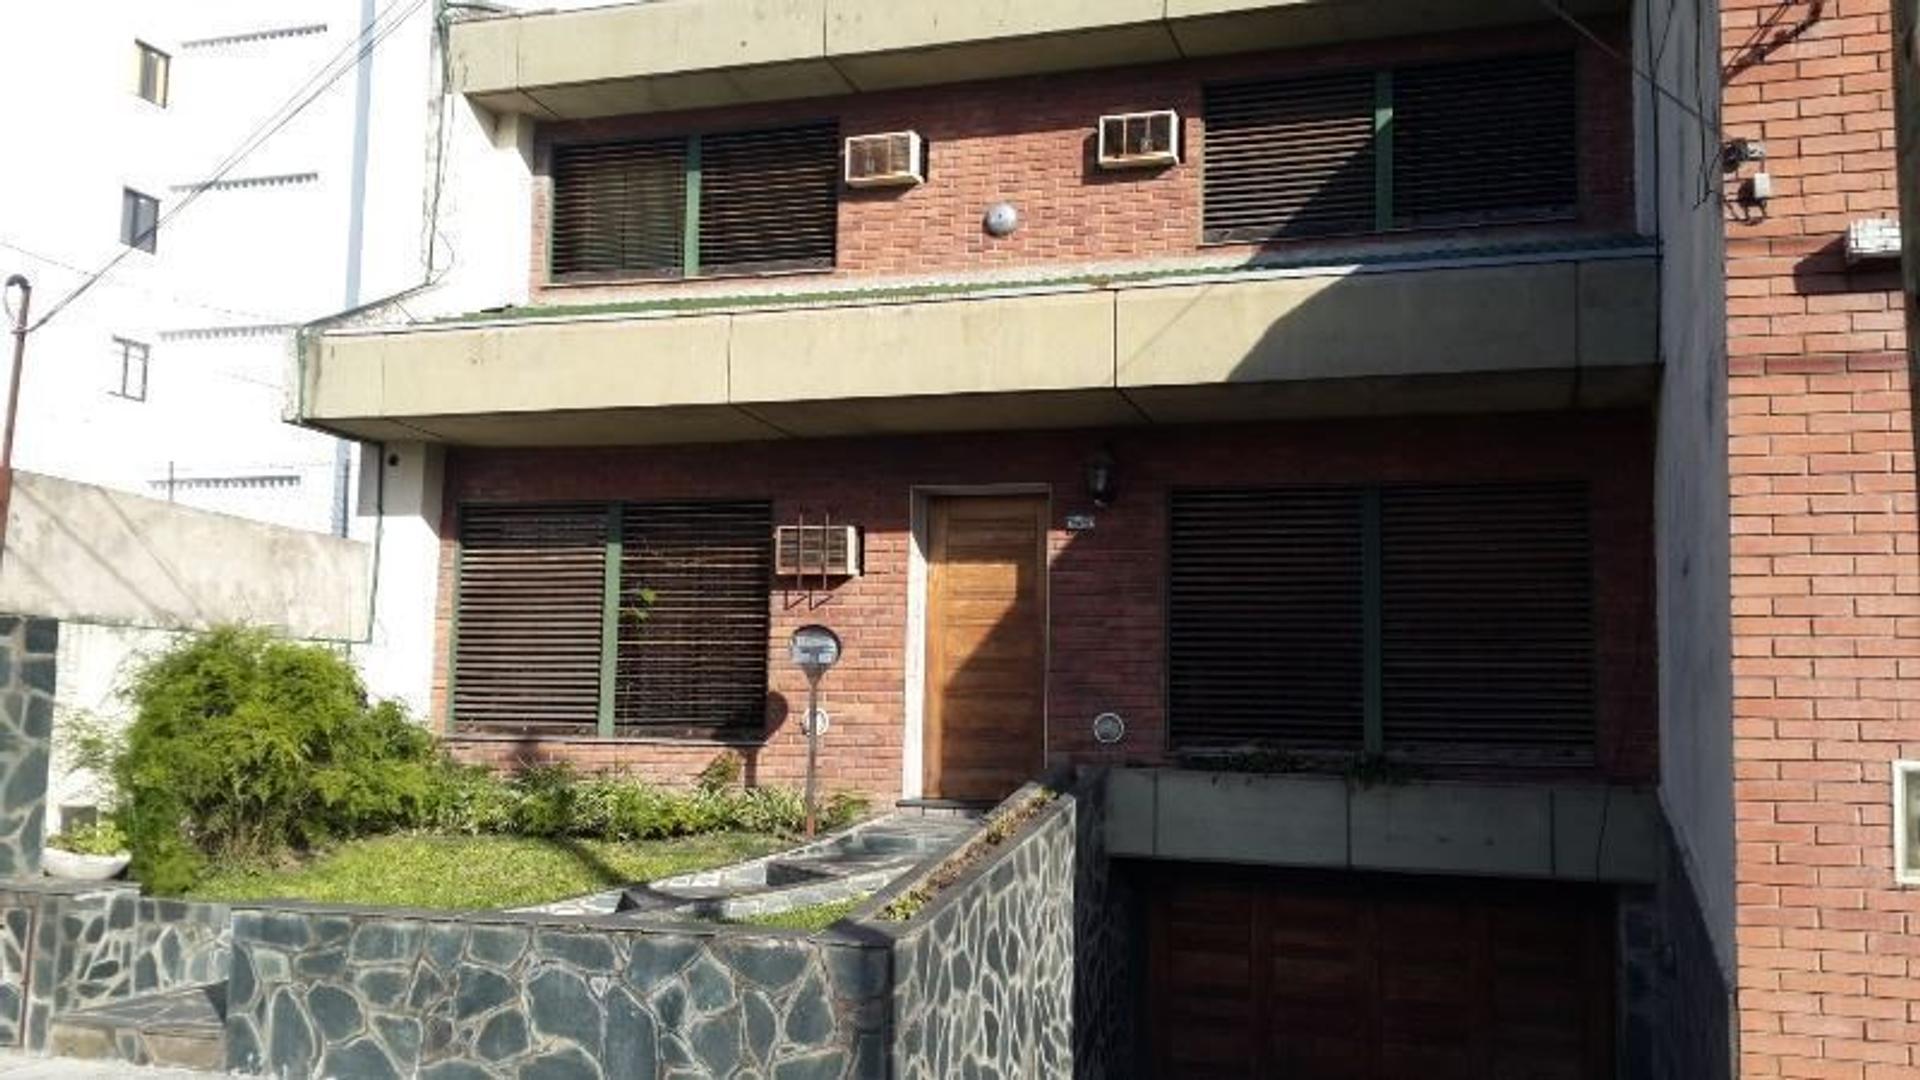 Casa venta - Caseros - San Jorge 2979 -